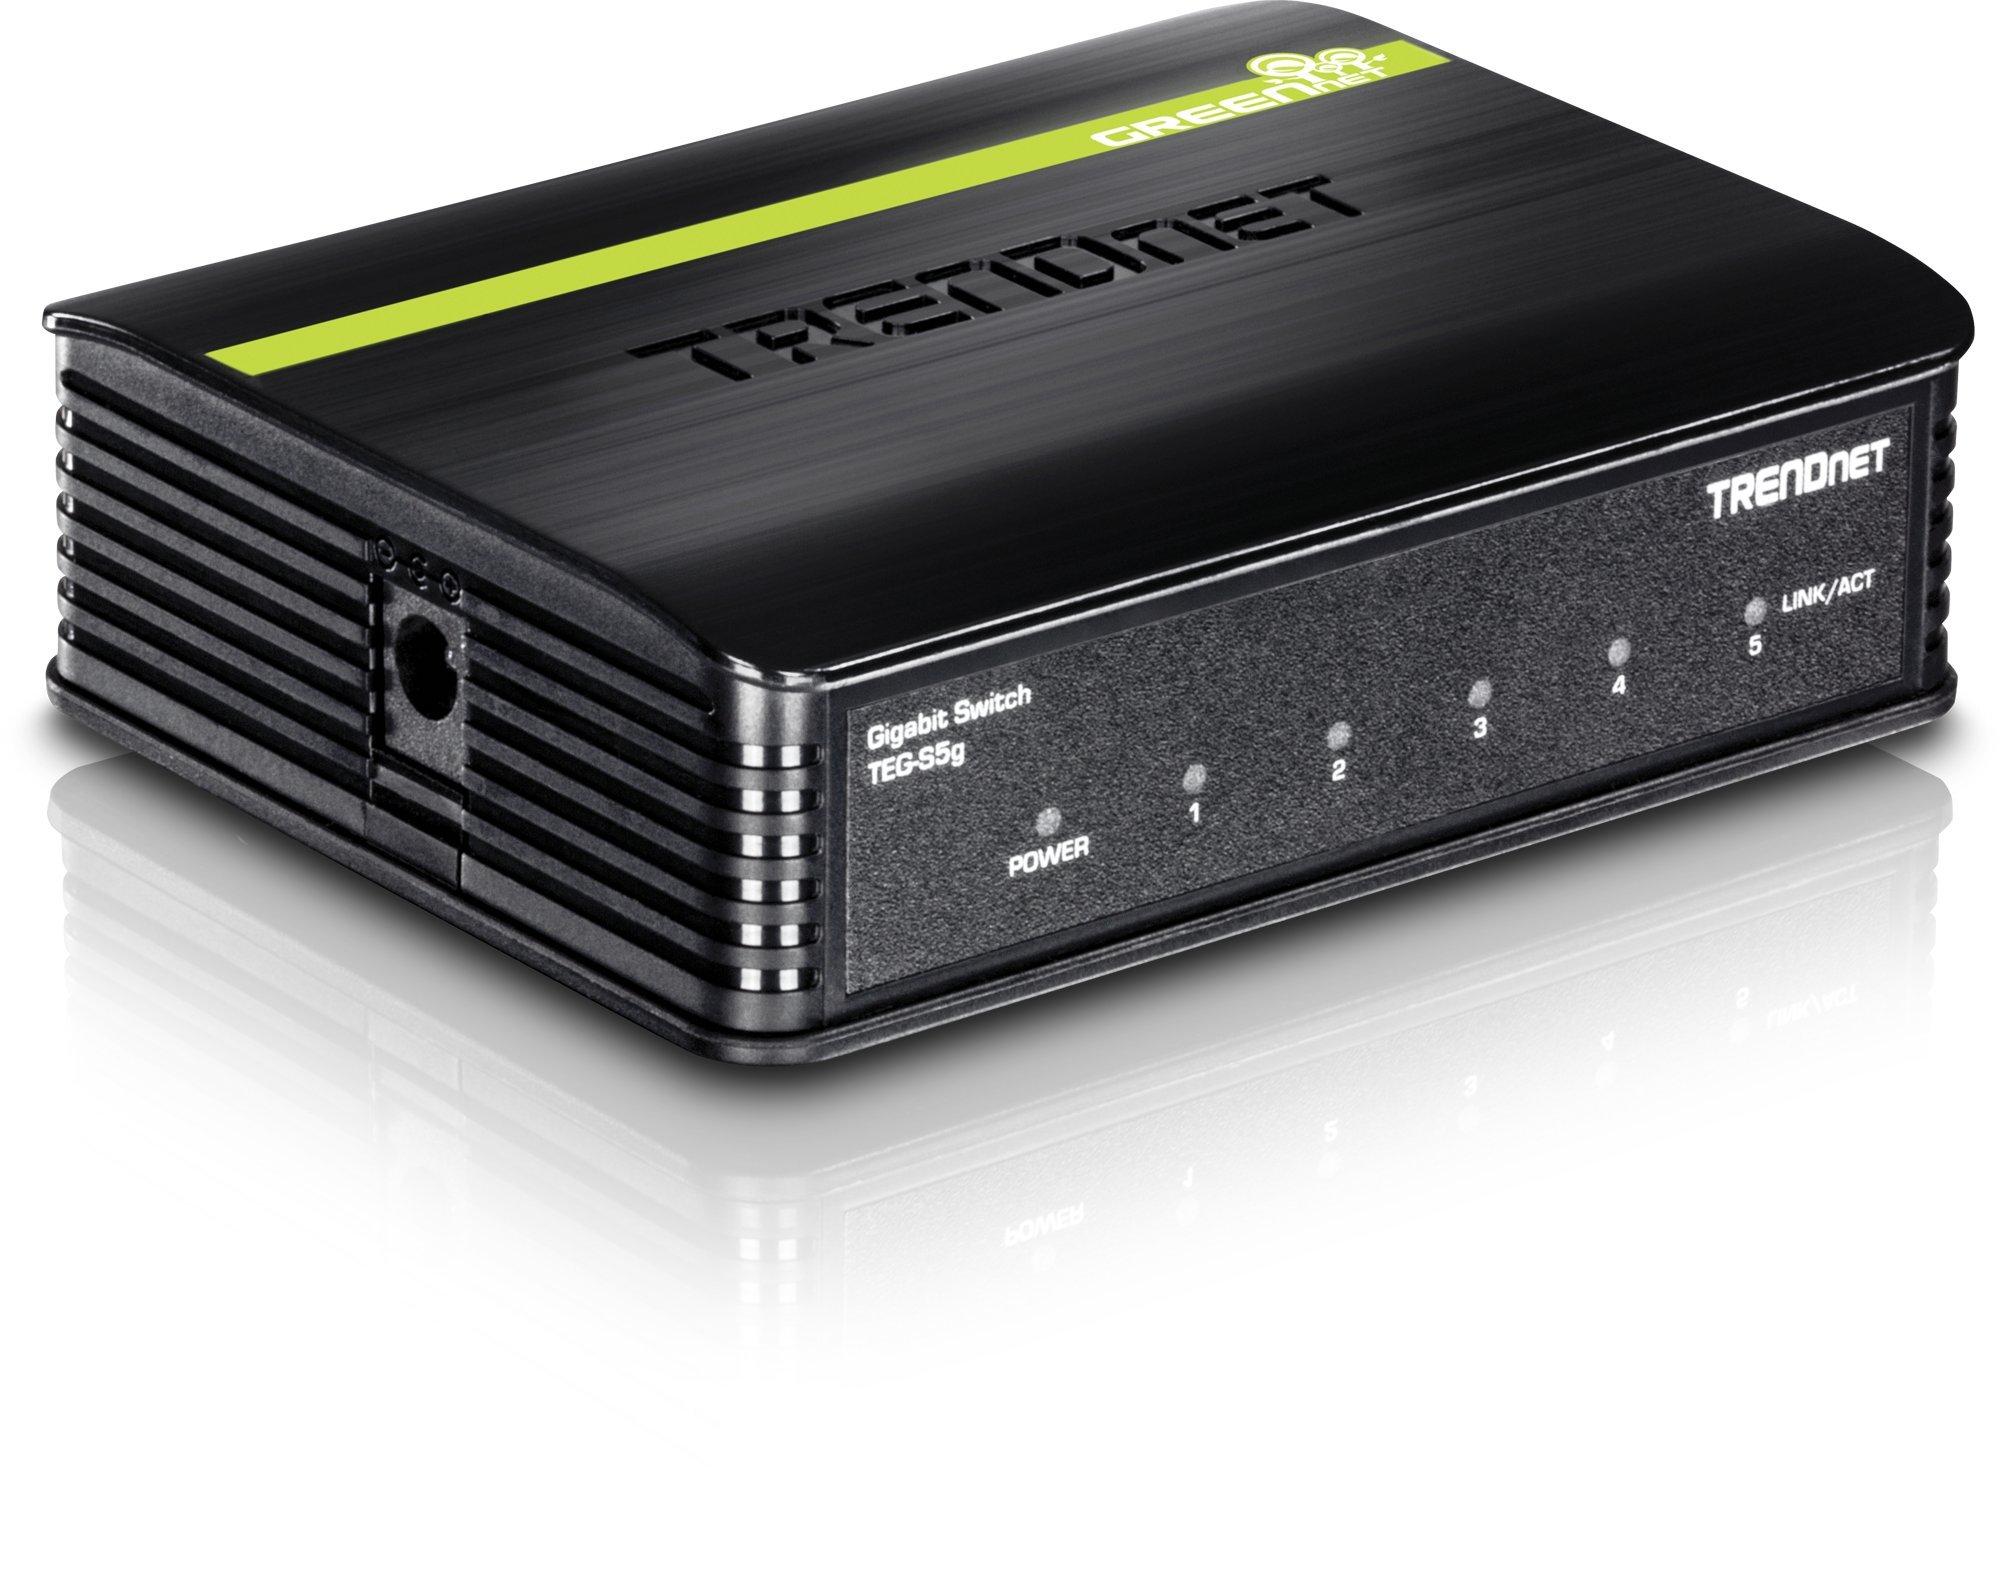 TRENDnet 5-Port Unmanaged Gigabit GREENnet Desktop Plastic Housing Switch, Plug & Play, 5 X Gigabit Ports, 10 Gbps, TEG-S5G by TRENDnet